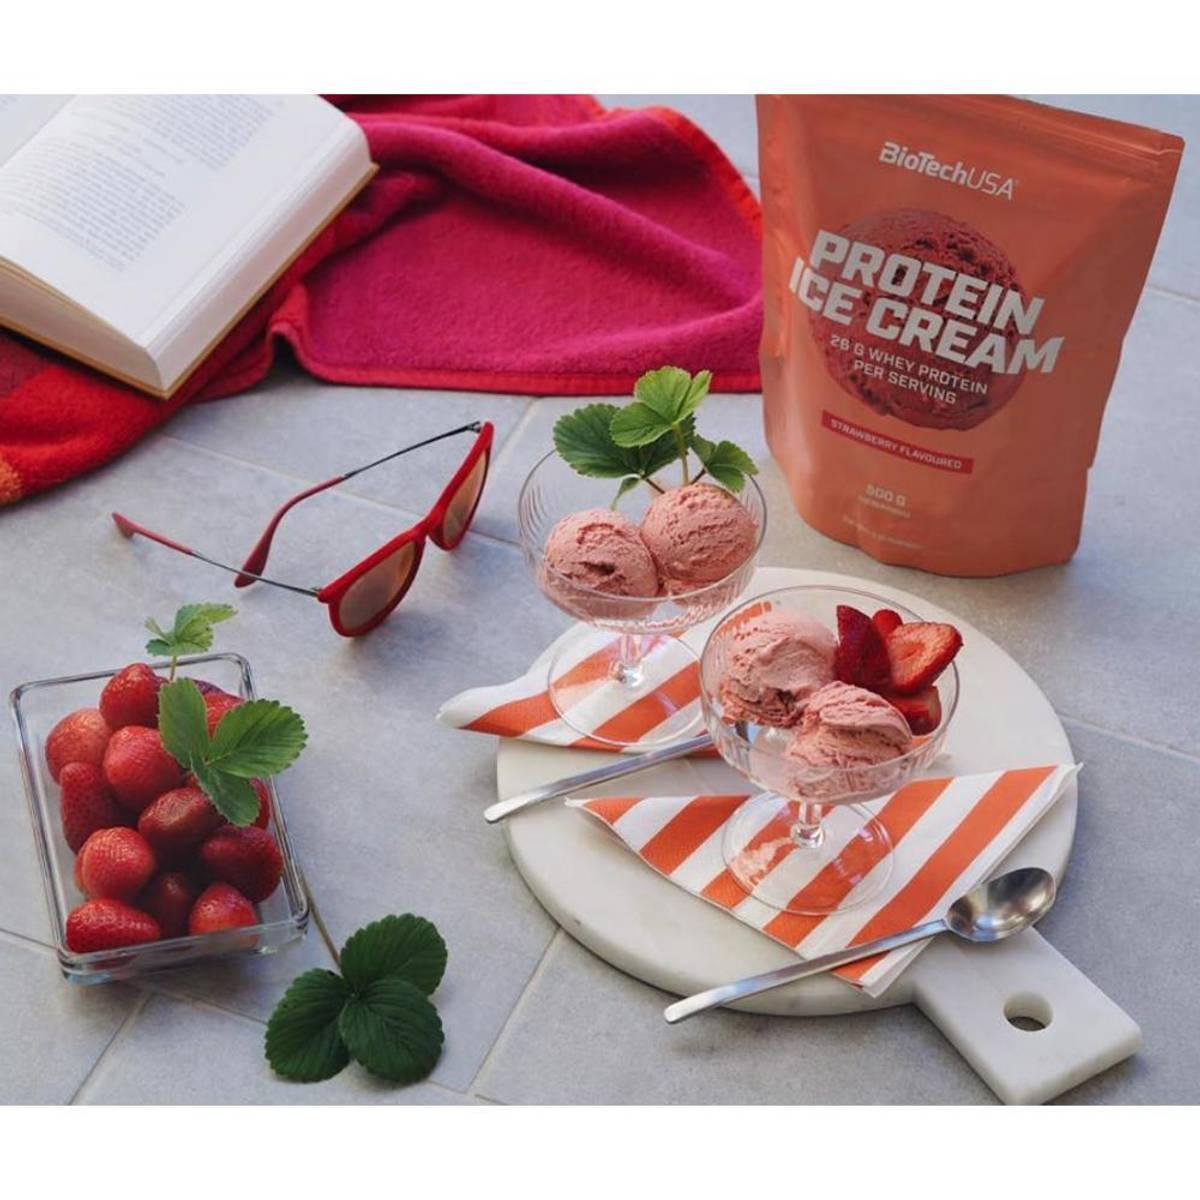 BiotechUSA - Protein Ice Cream Strawberry 500g